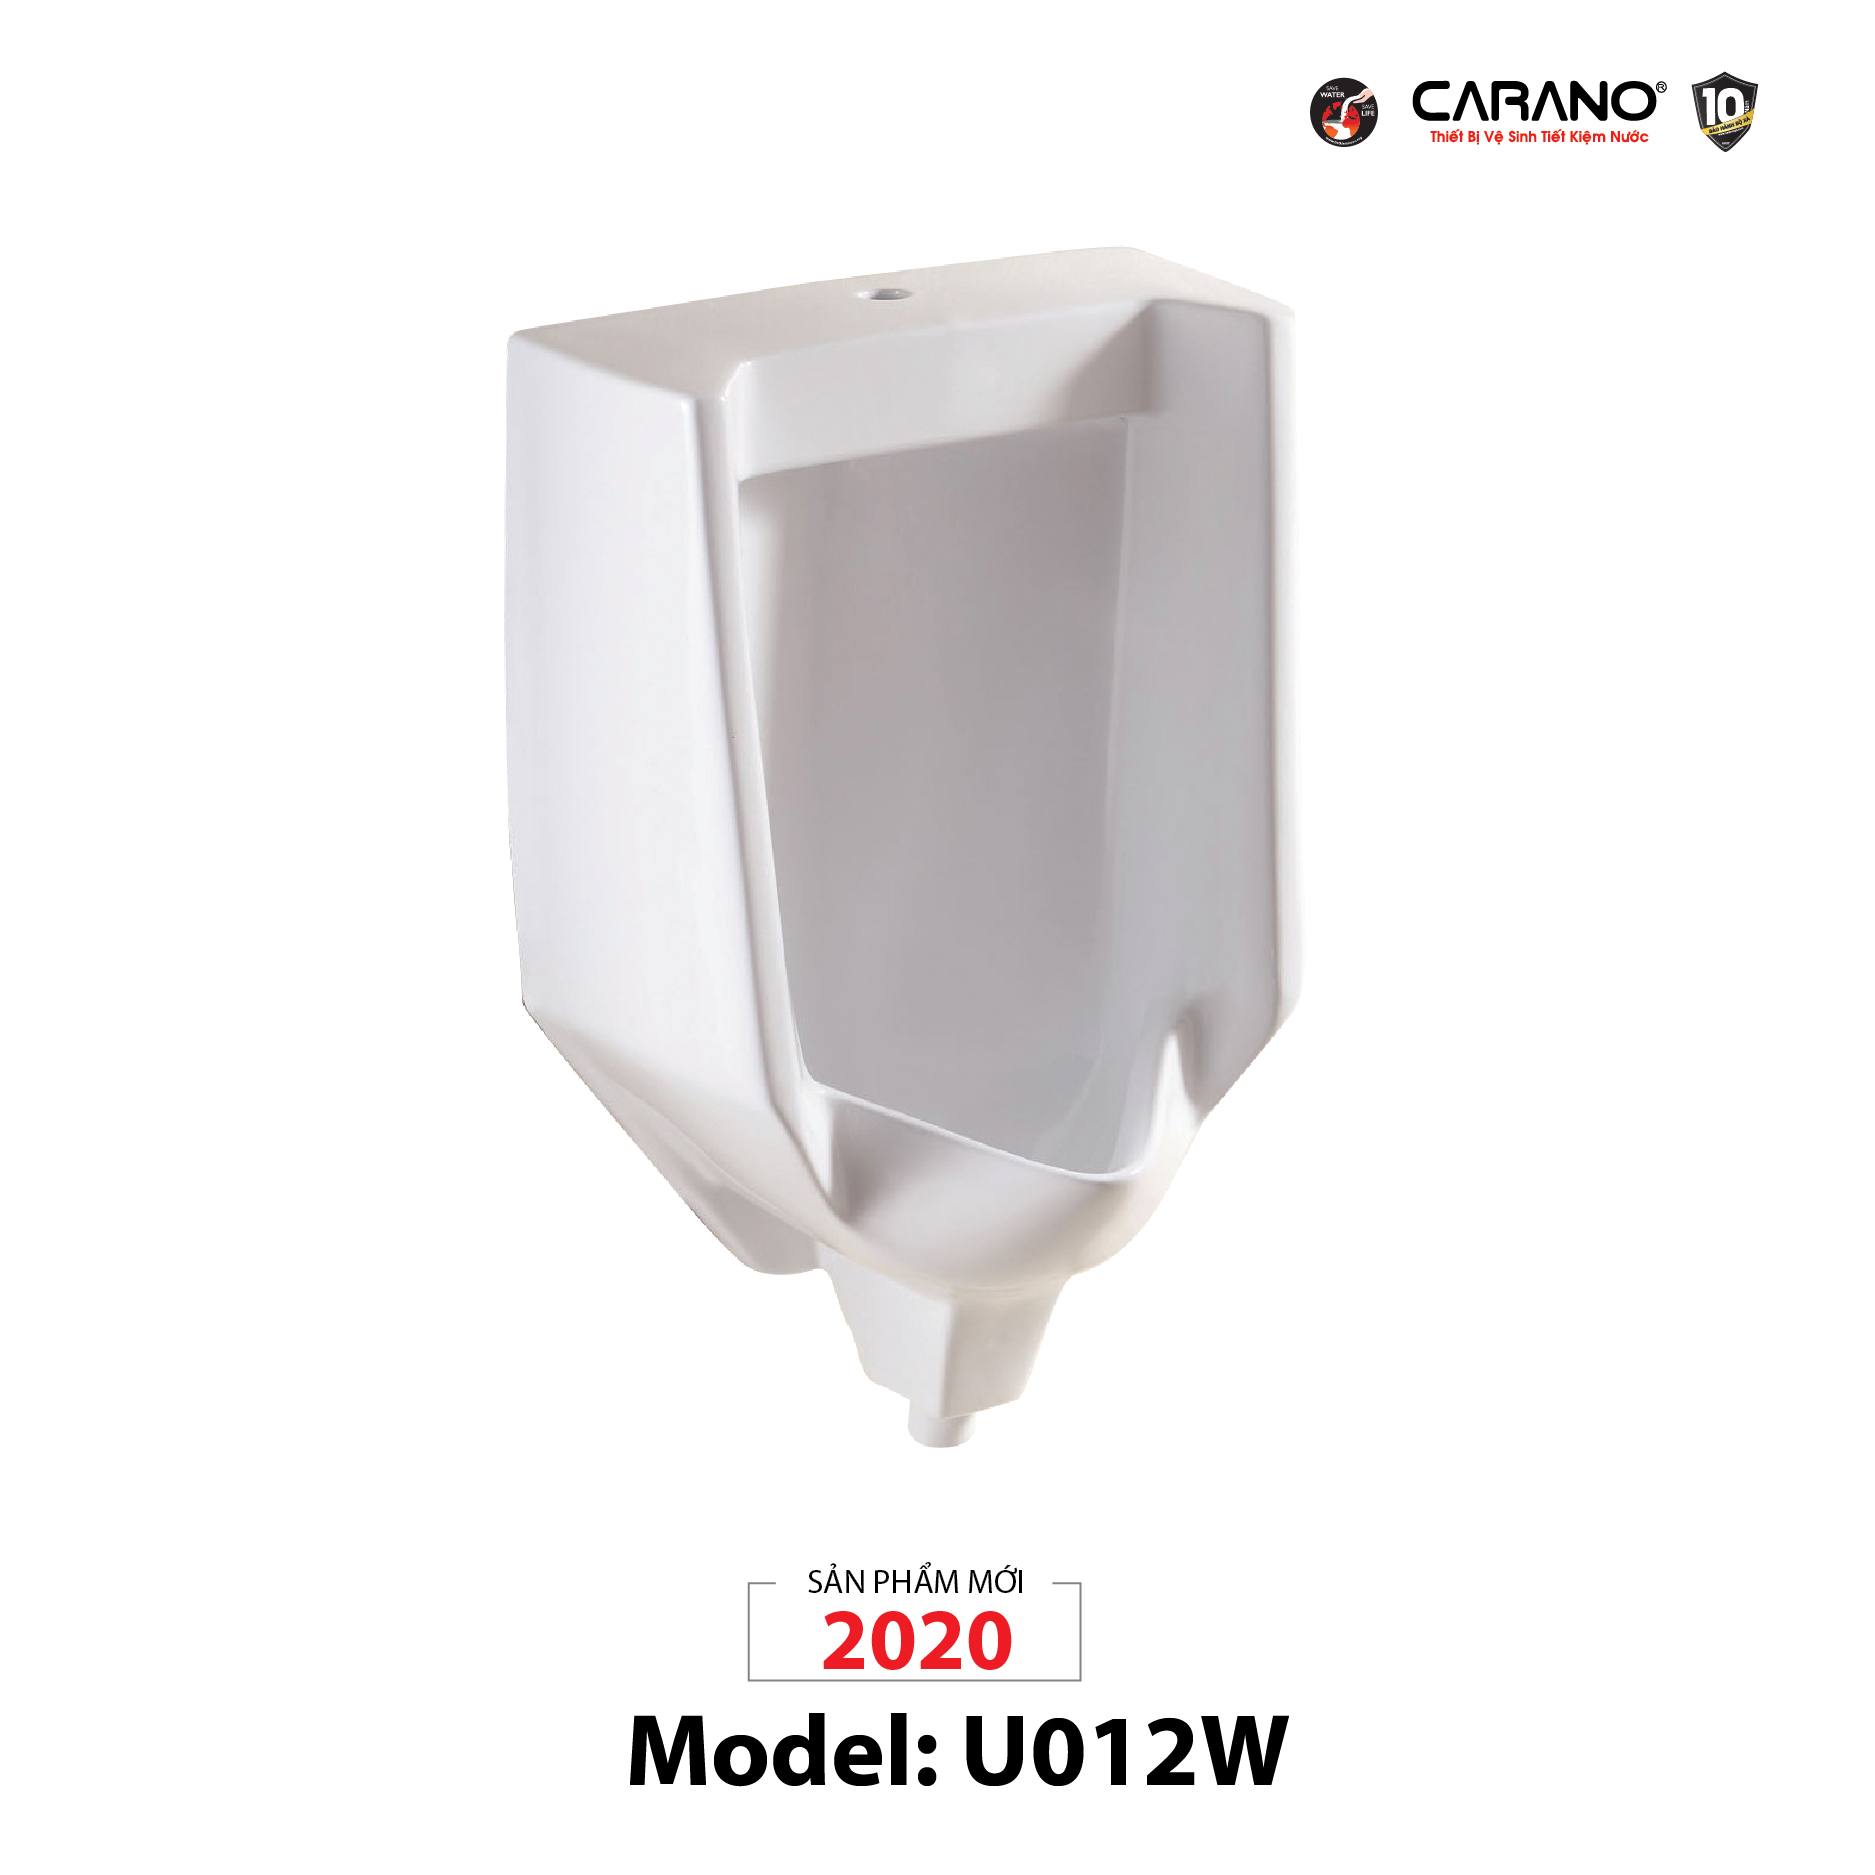 BỒN TIỂU NAM MODEL U012W (TOILET MODEL: U012W)